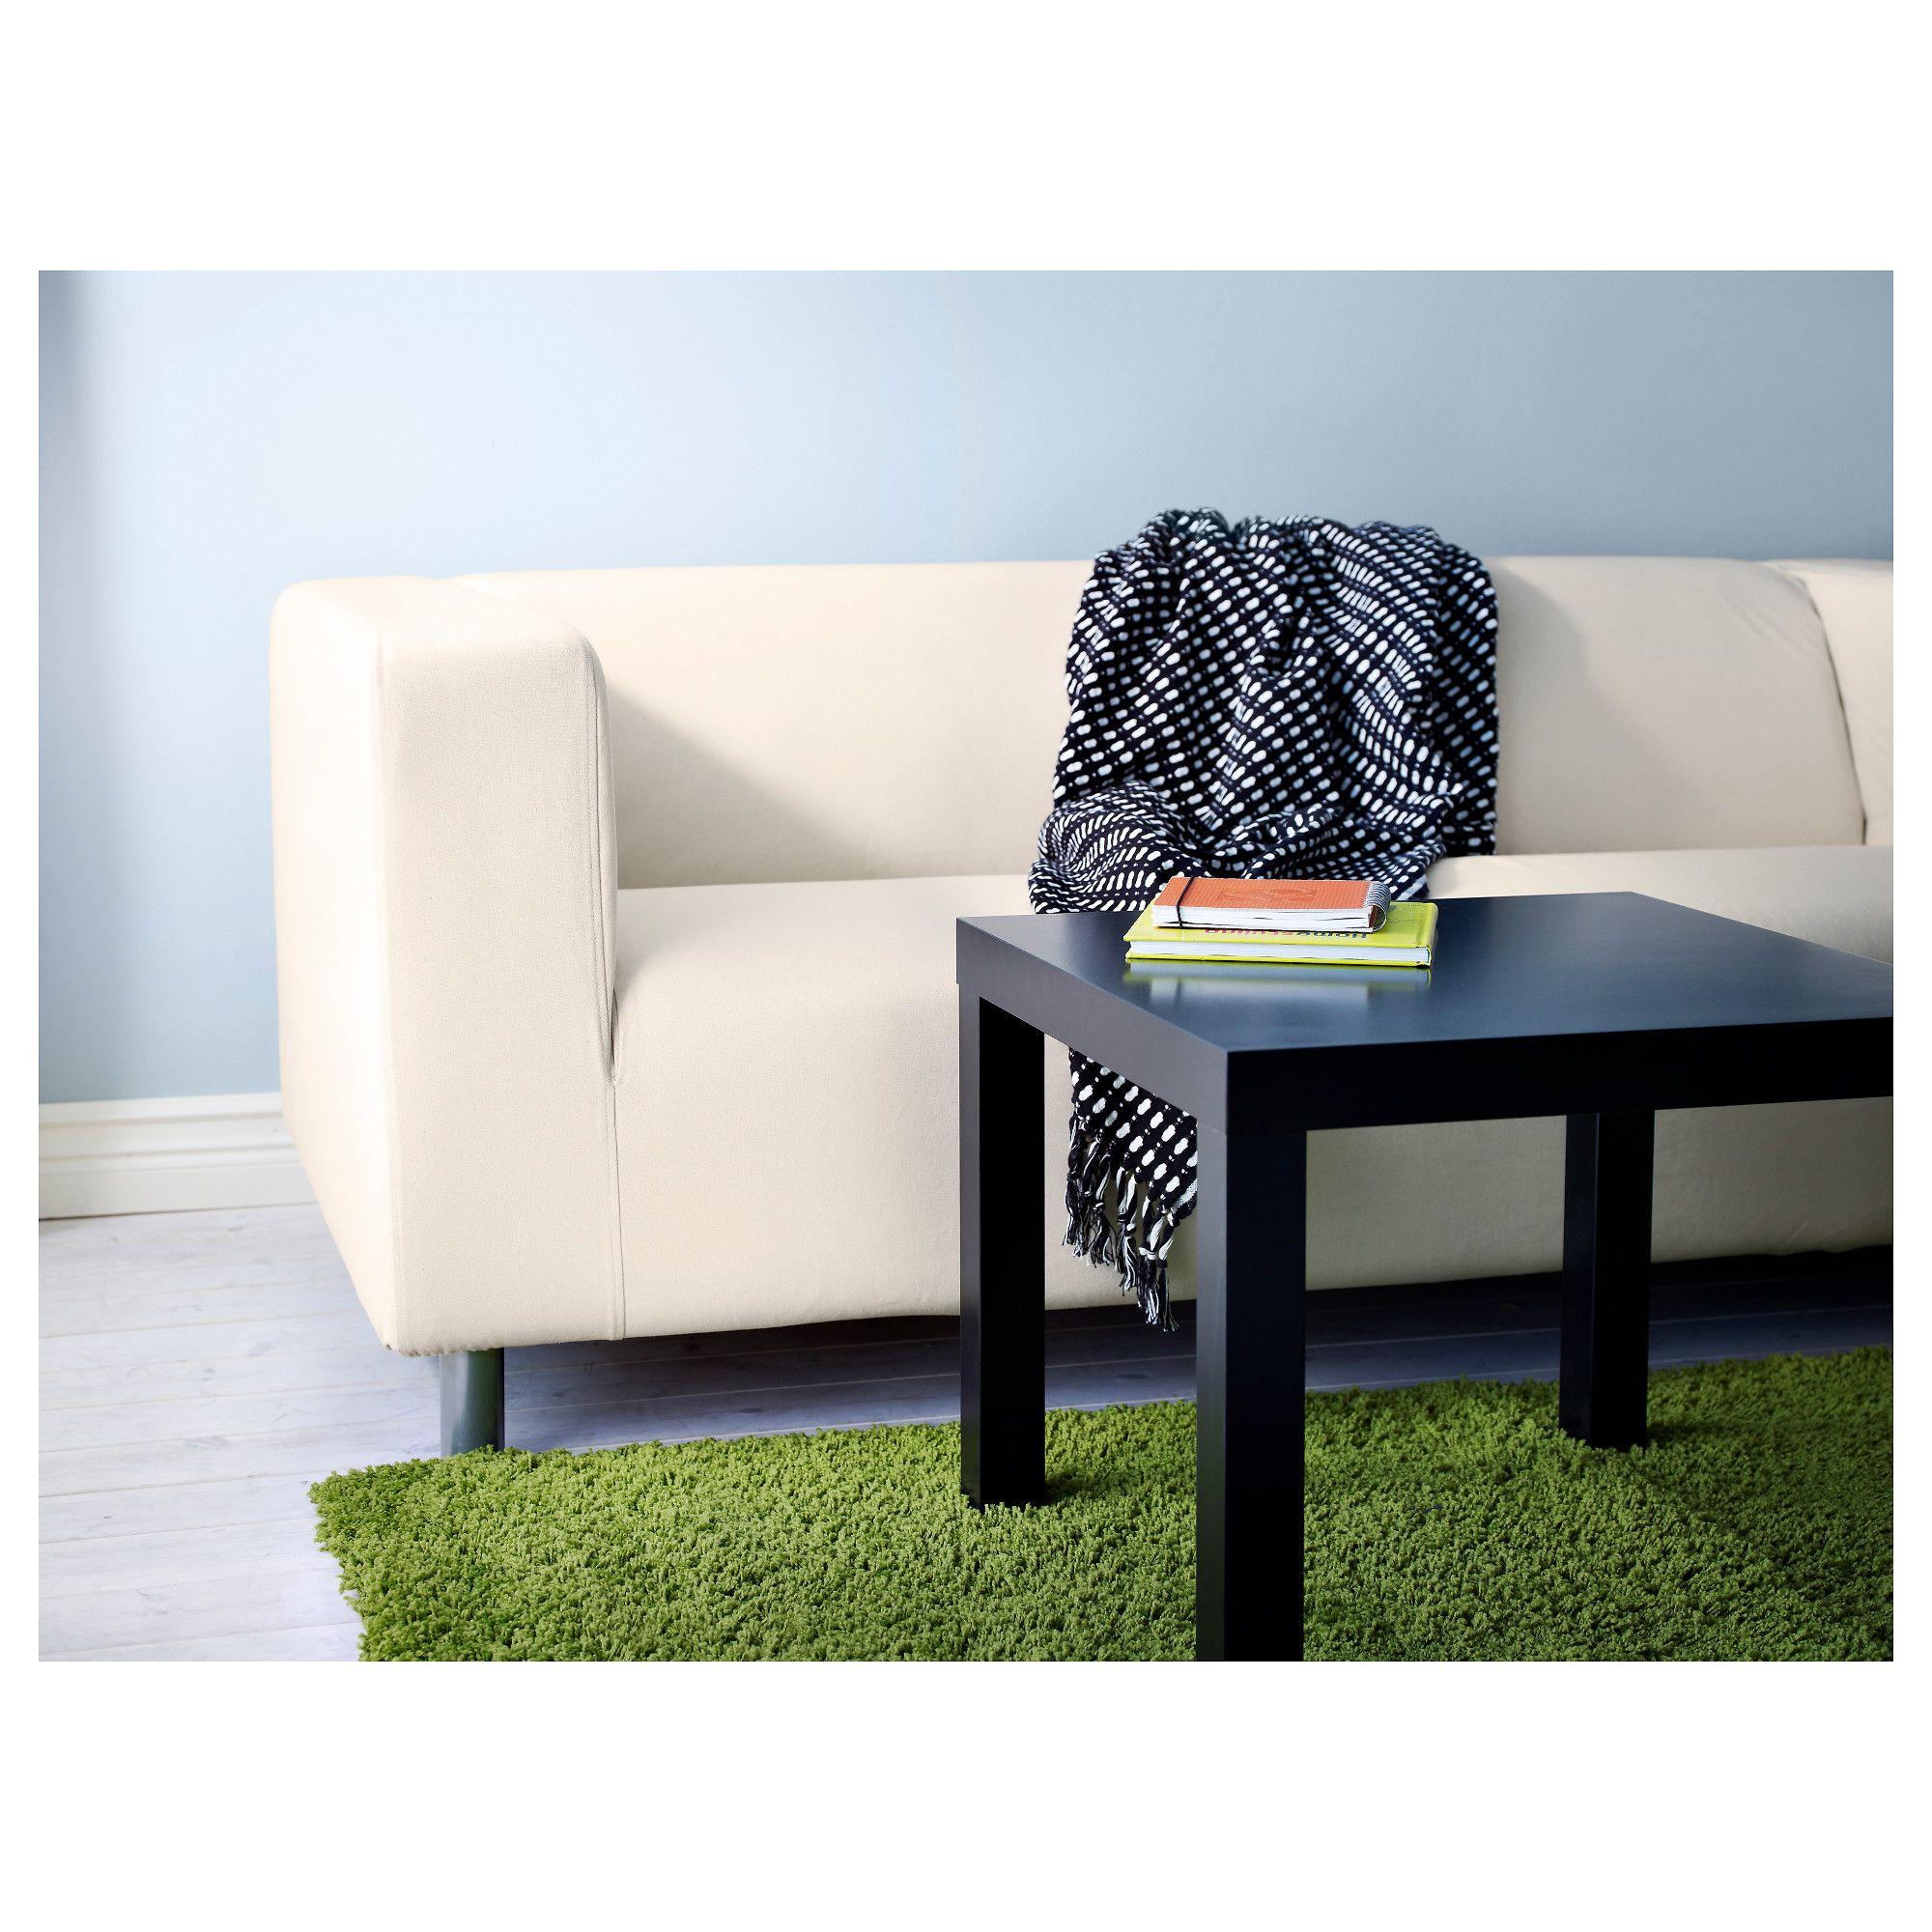 Furniture and Home Furnishings Home furnishings, Ikea